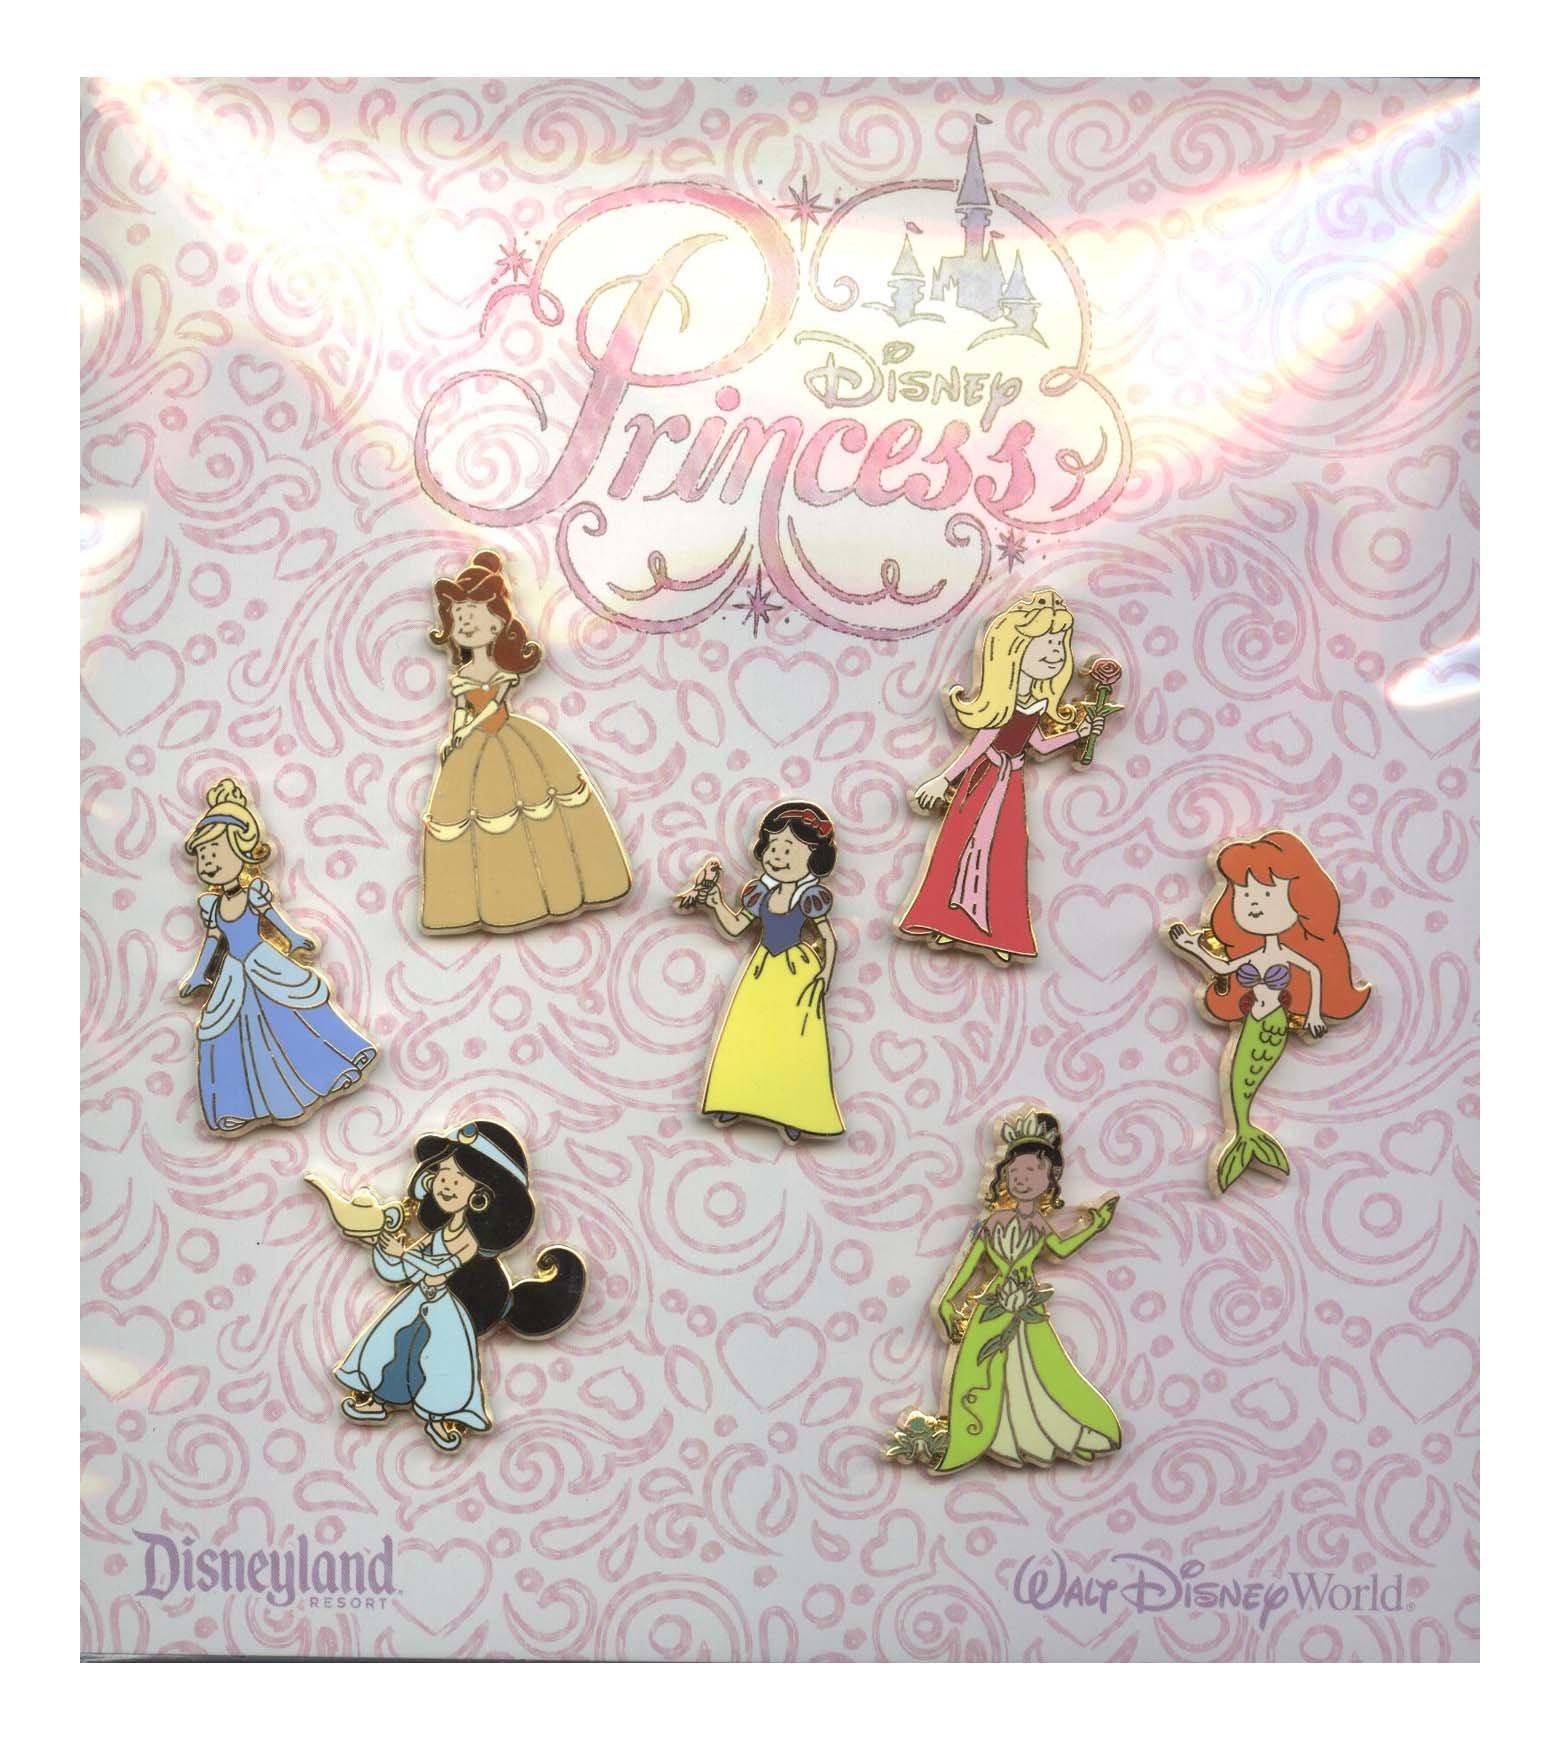 Disney Pin - Princess Dress Up - 7 Pin Set by Disney (Image #1)